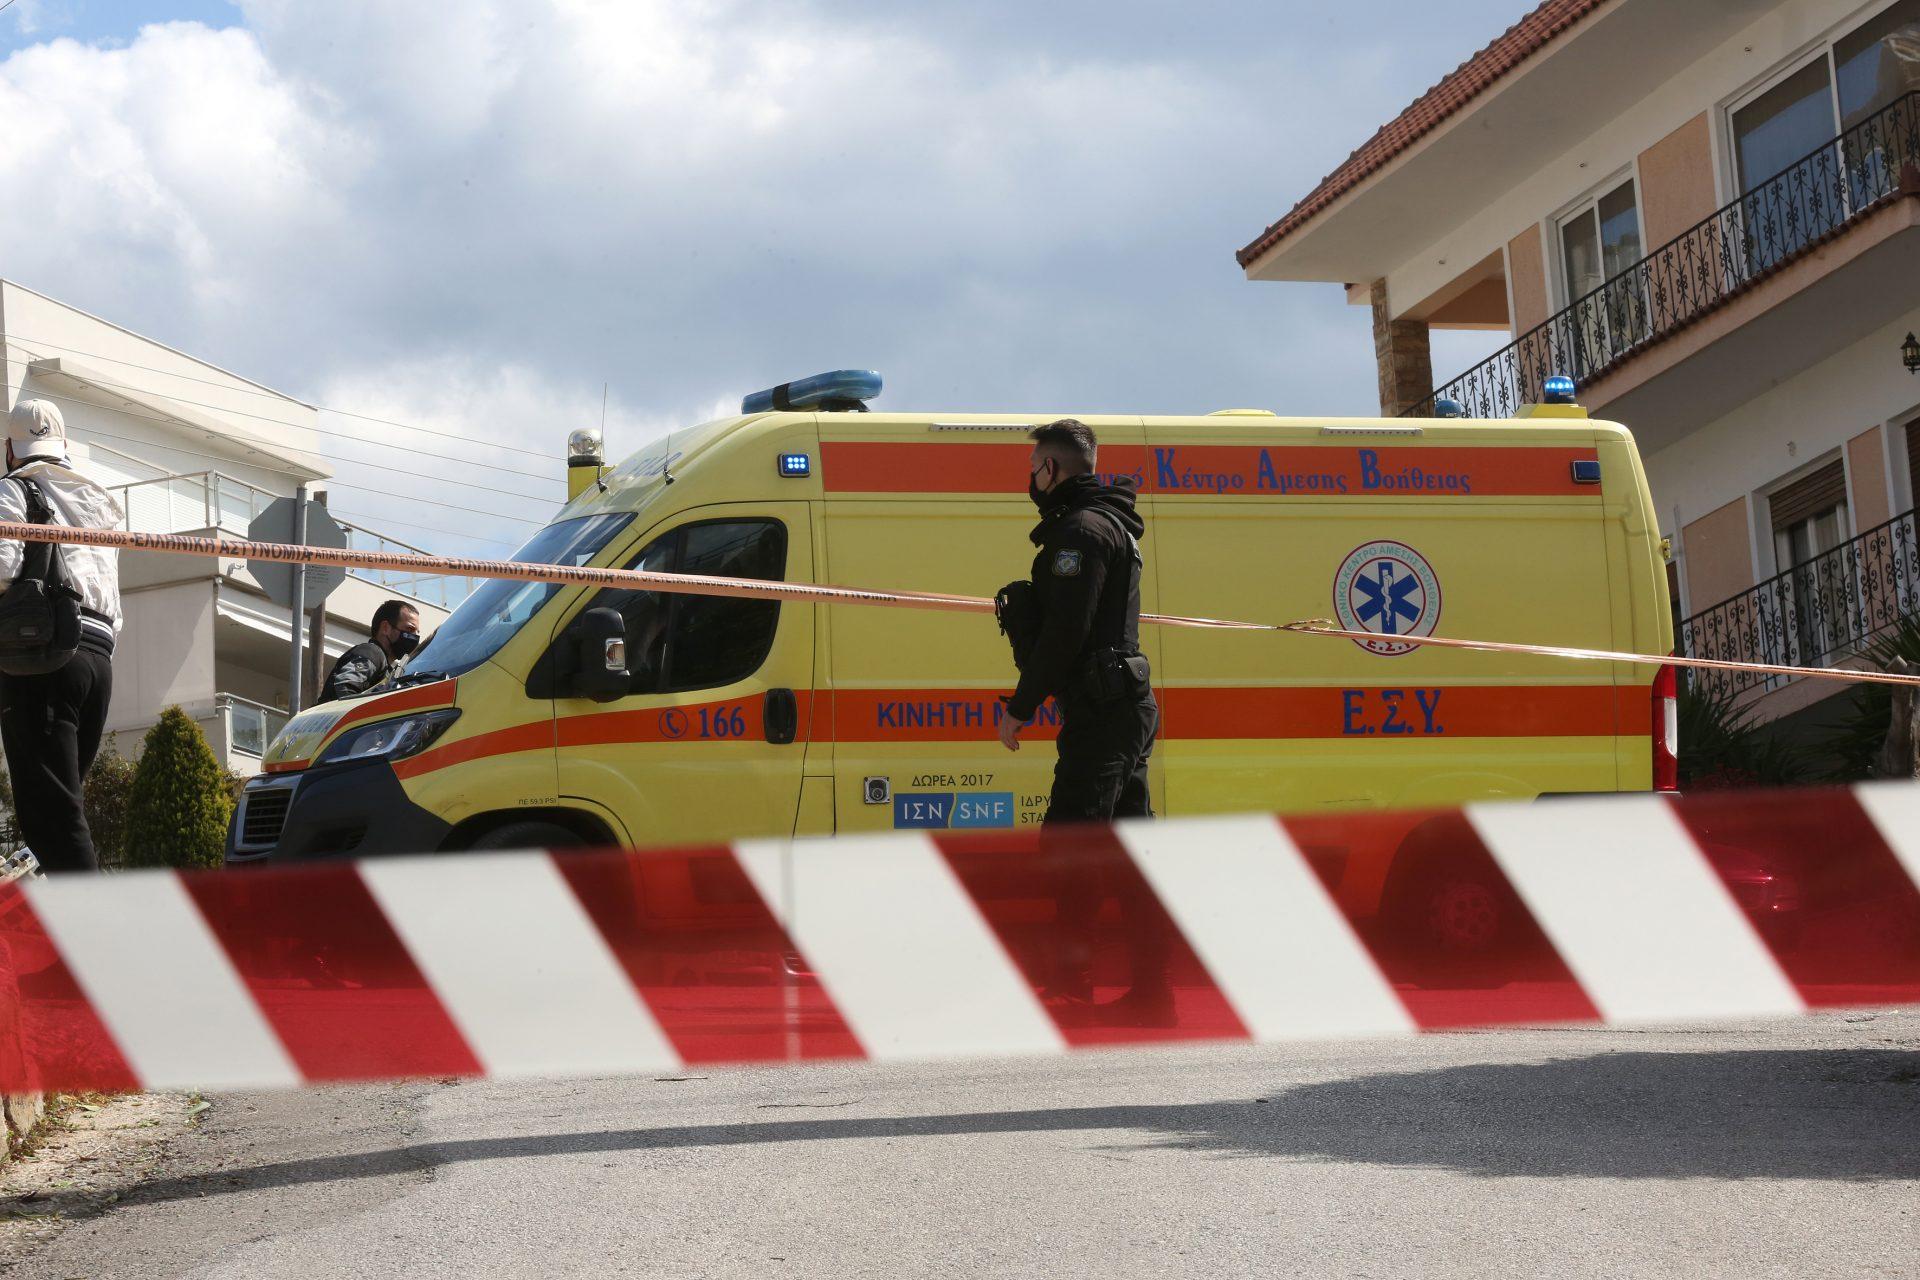 Jorgos Karaivaz, novinar, ubijen